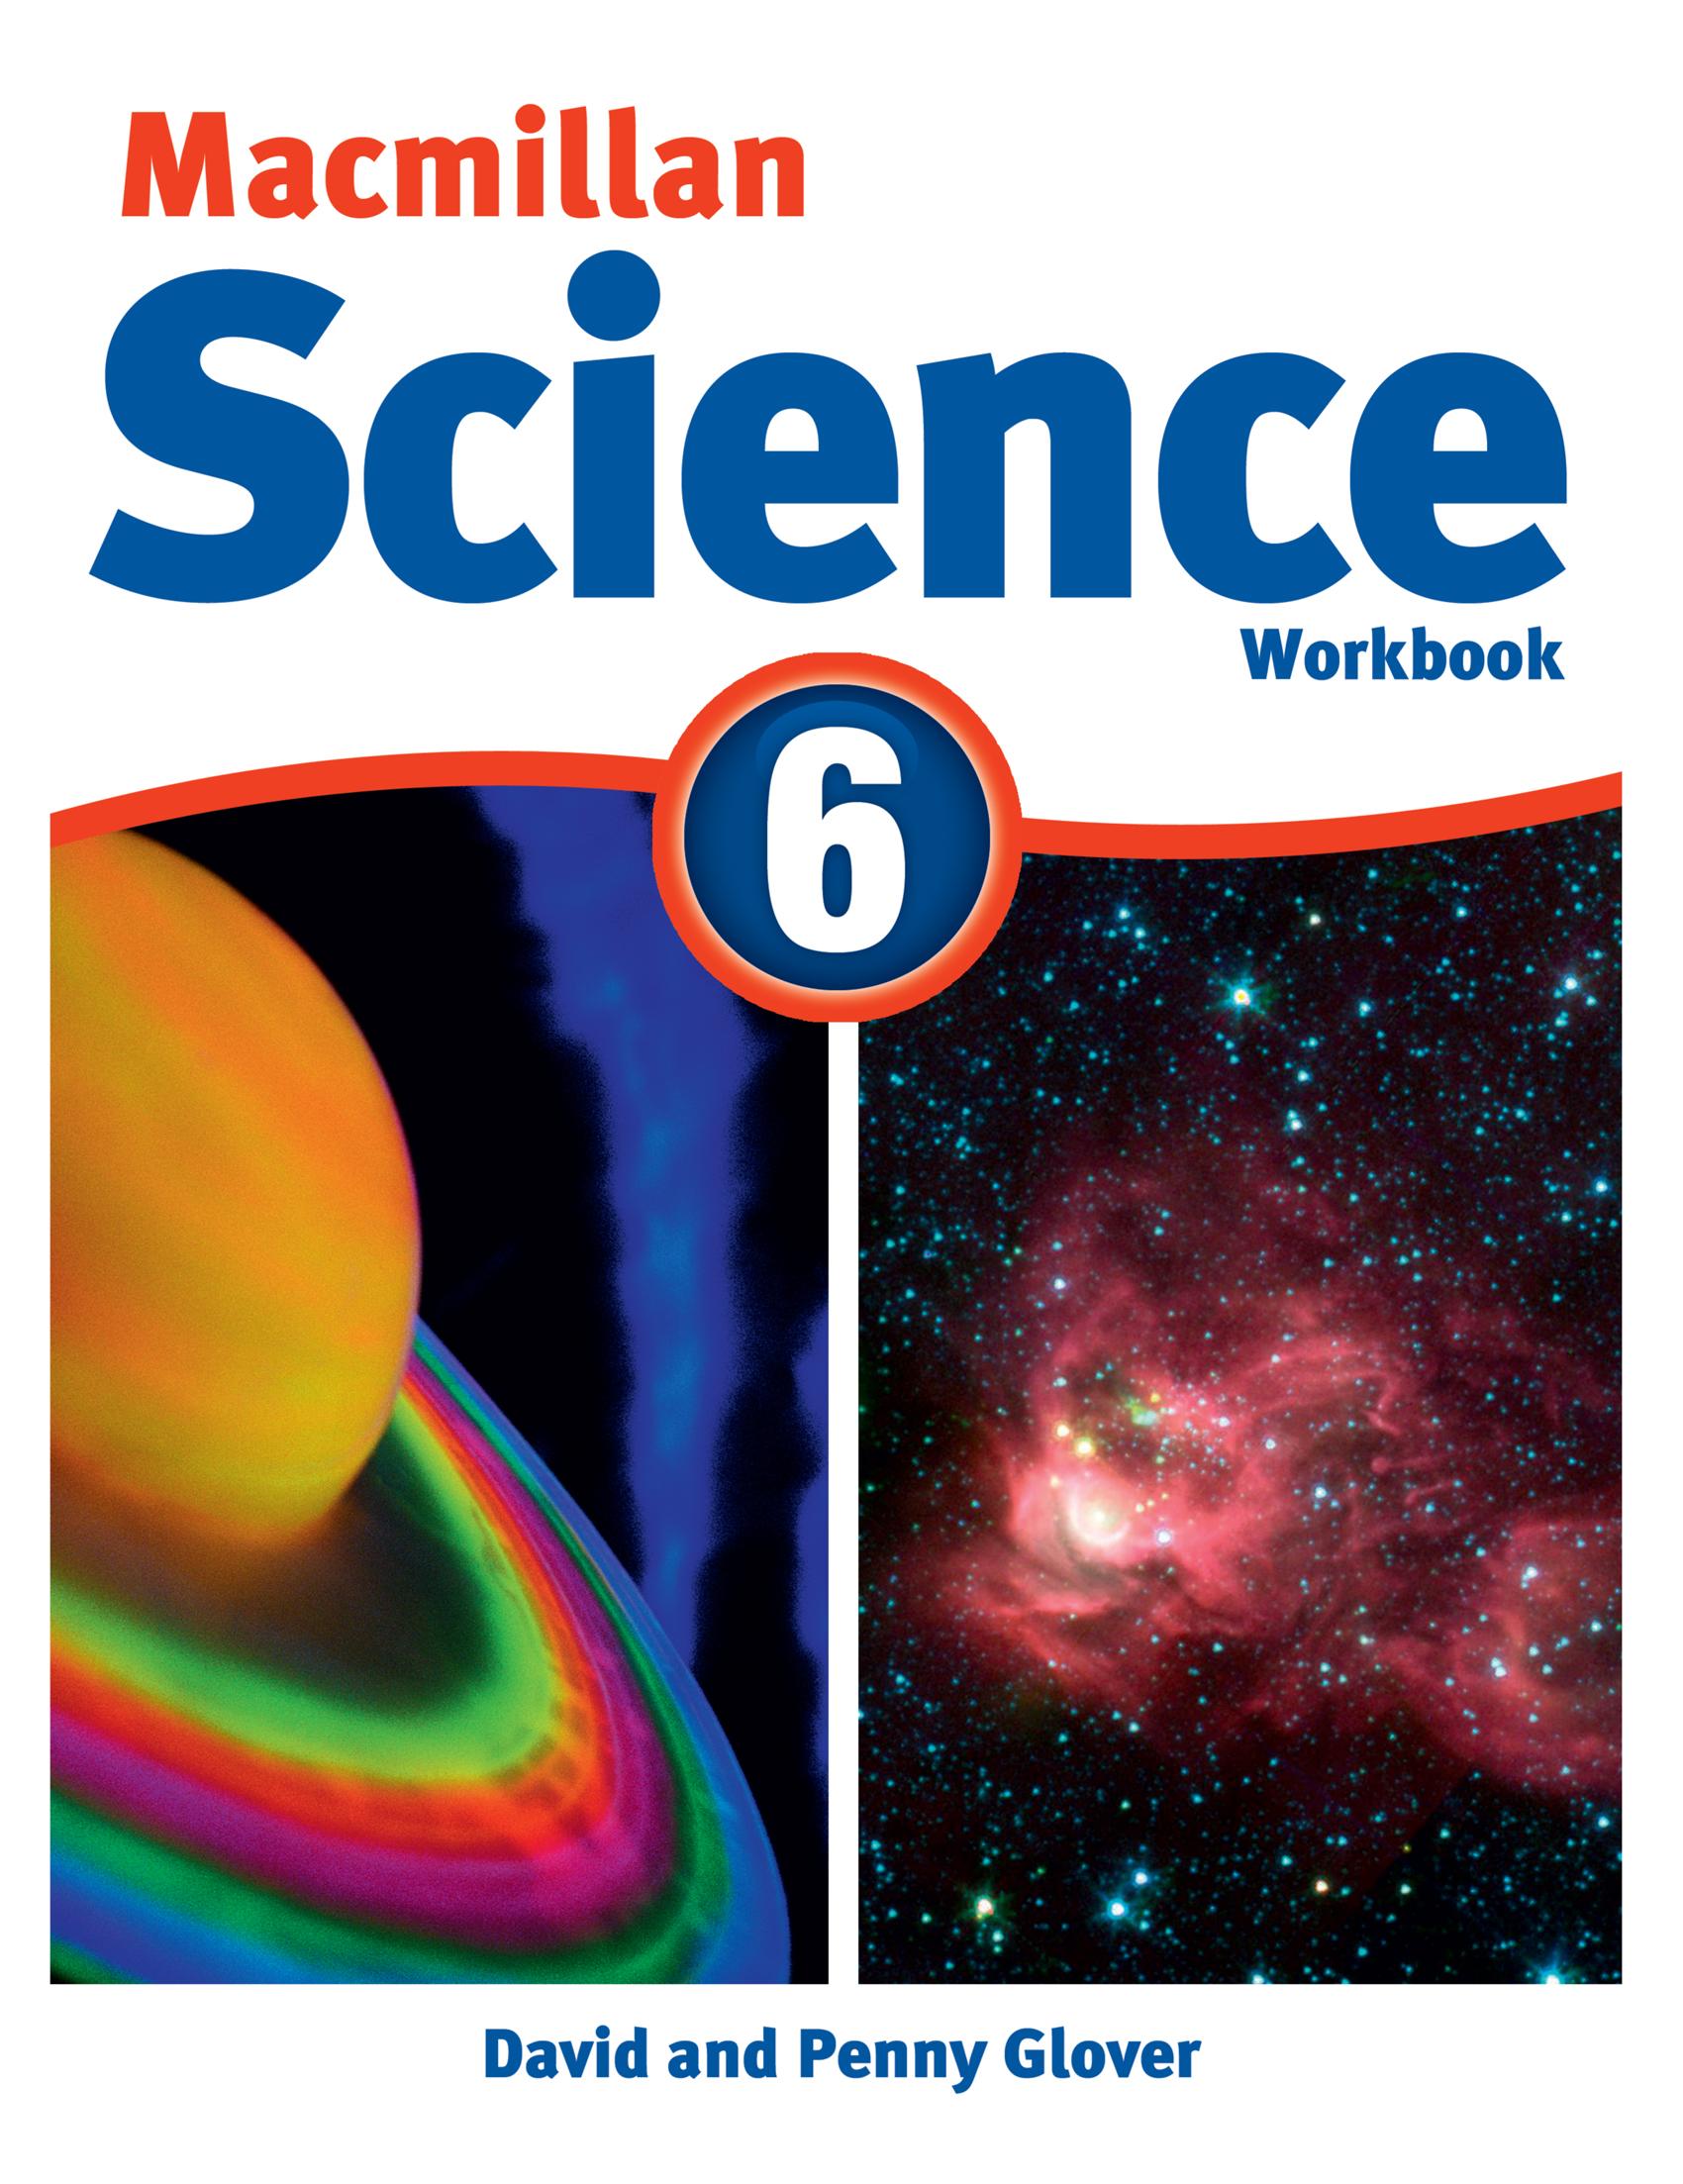 Macmillan Science Level 6 Workbook